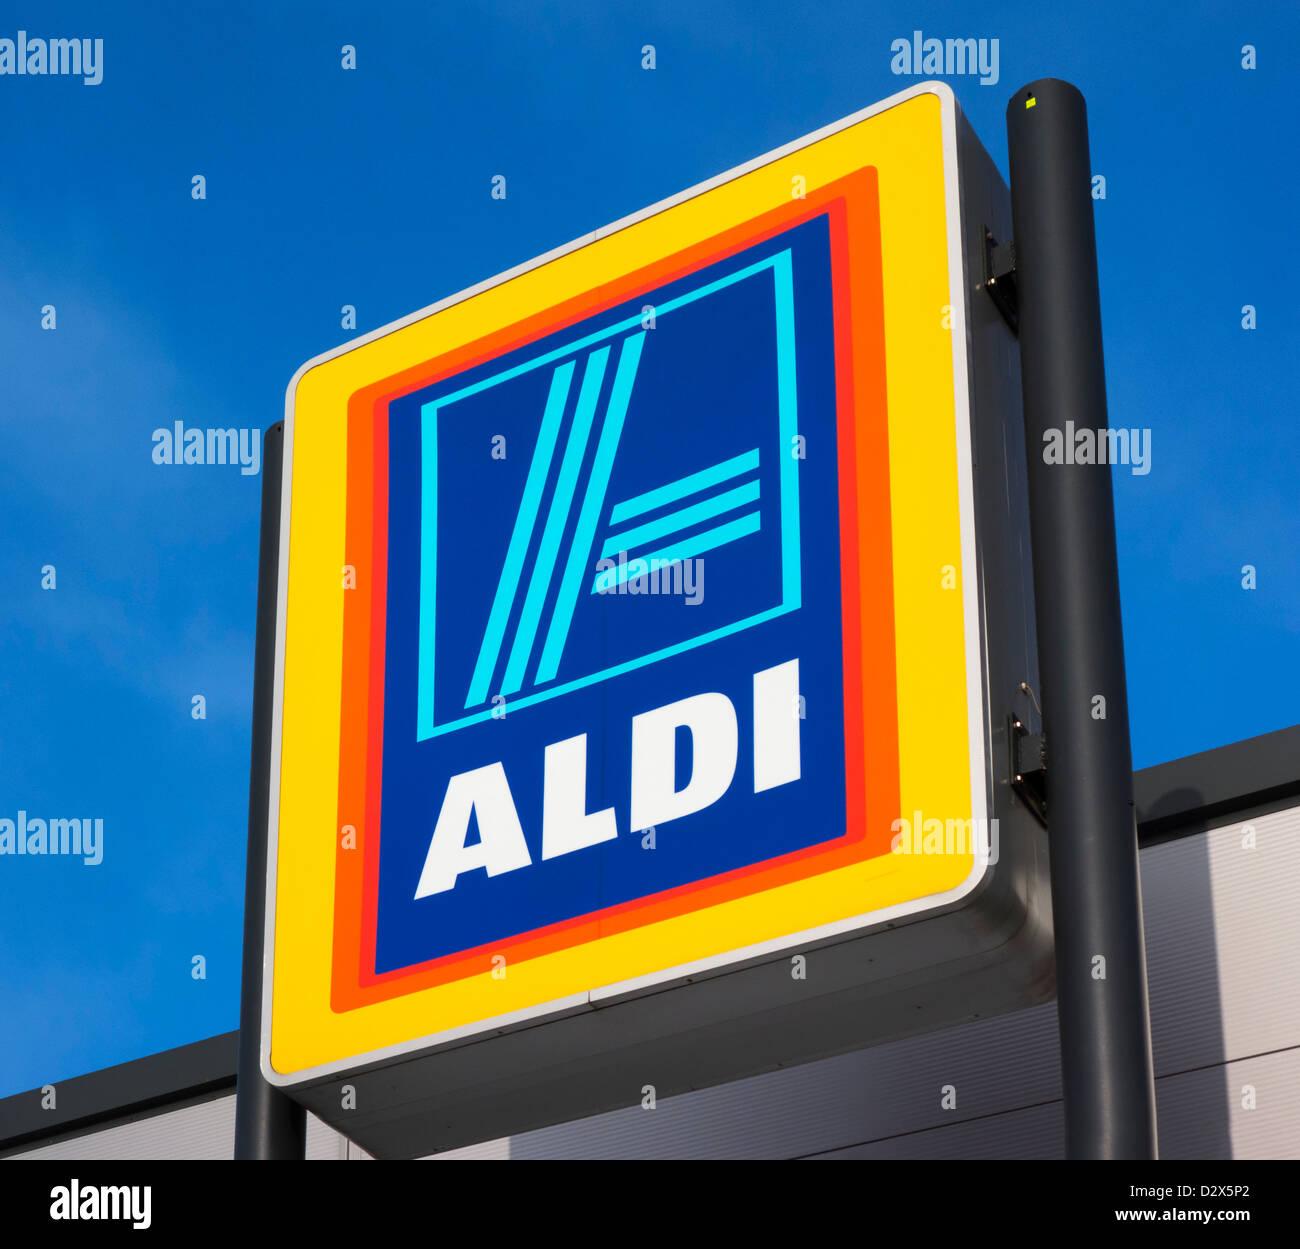 Aldi supermarket, Waterloo, Huddersfield, West Yorkshire, UK Stock Photo